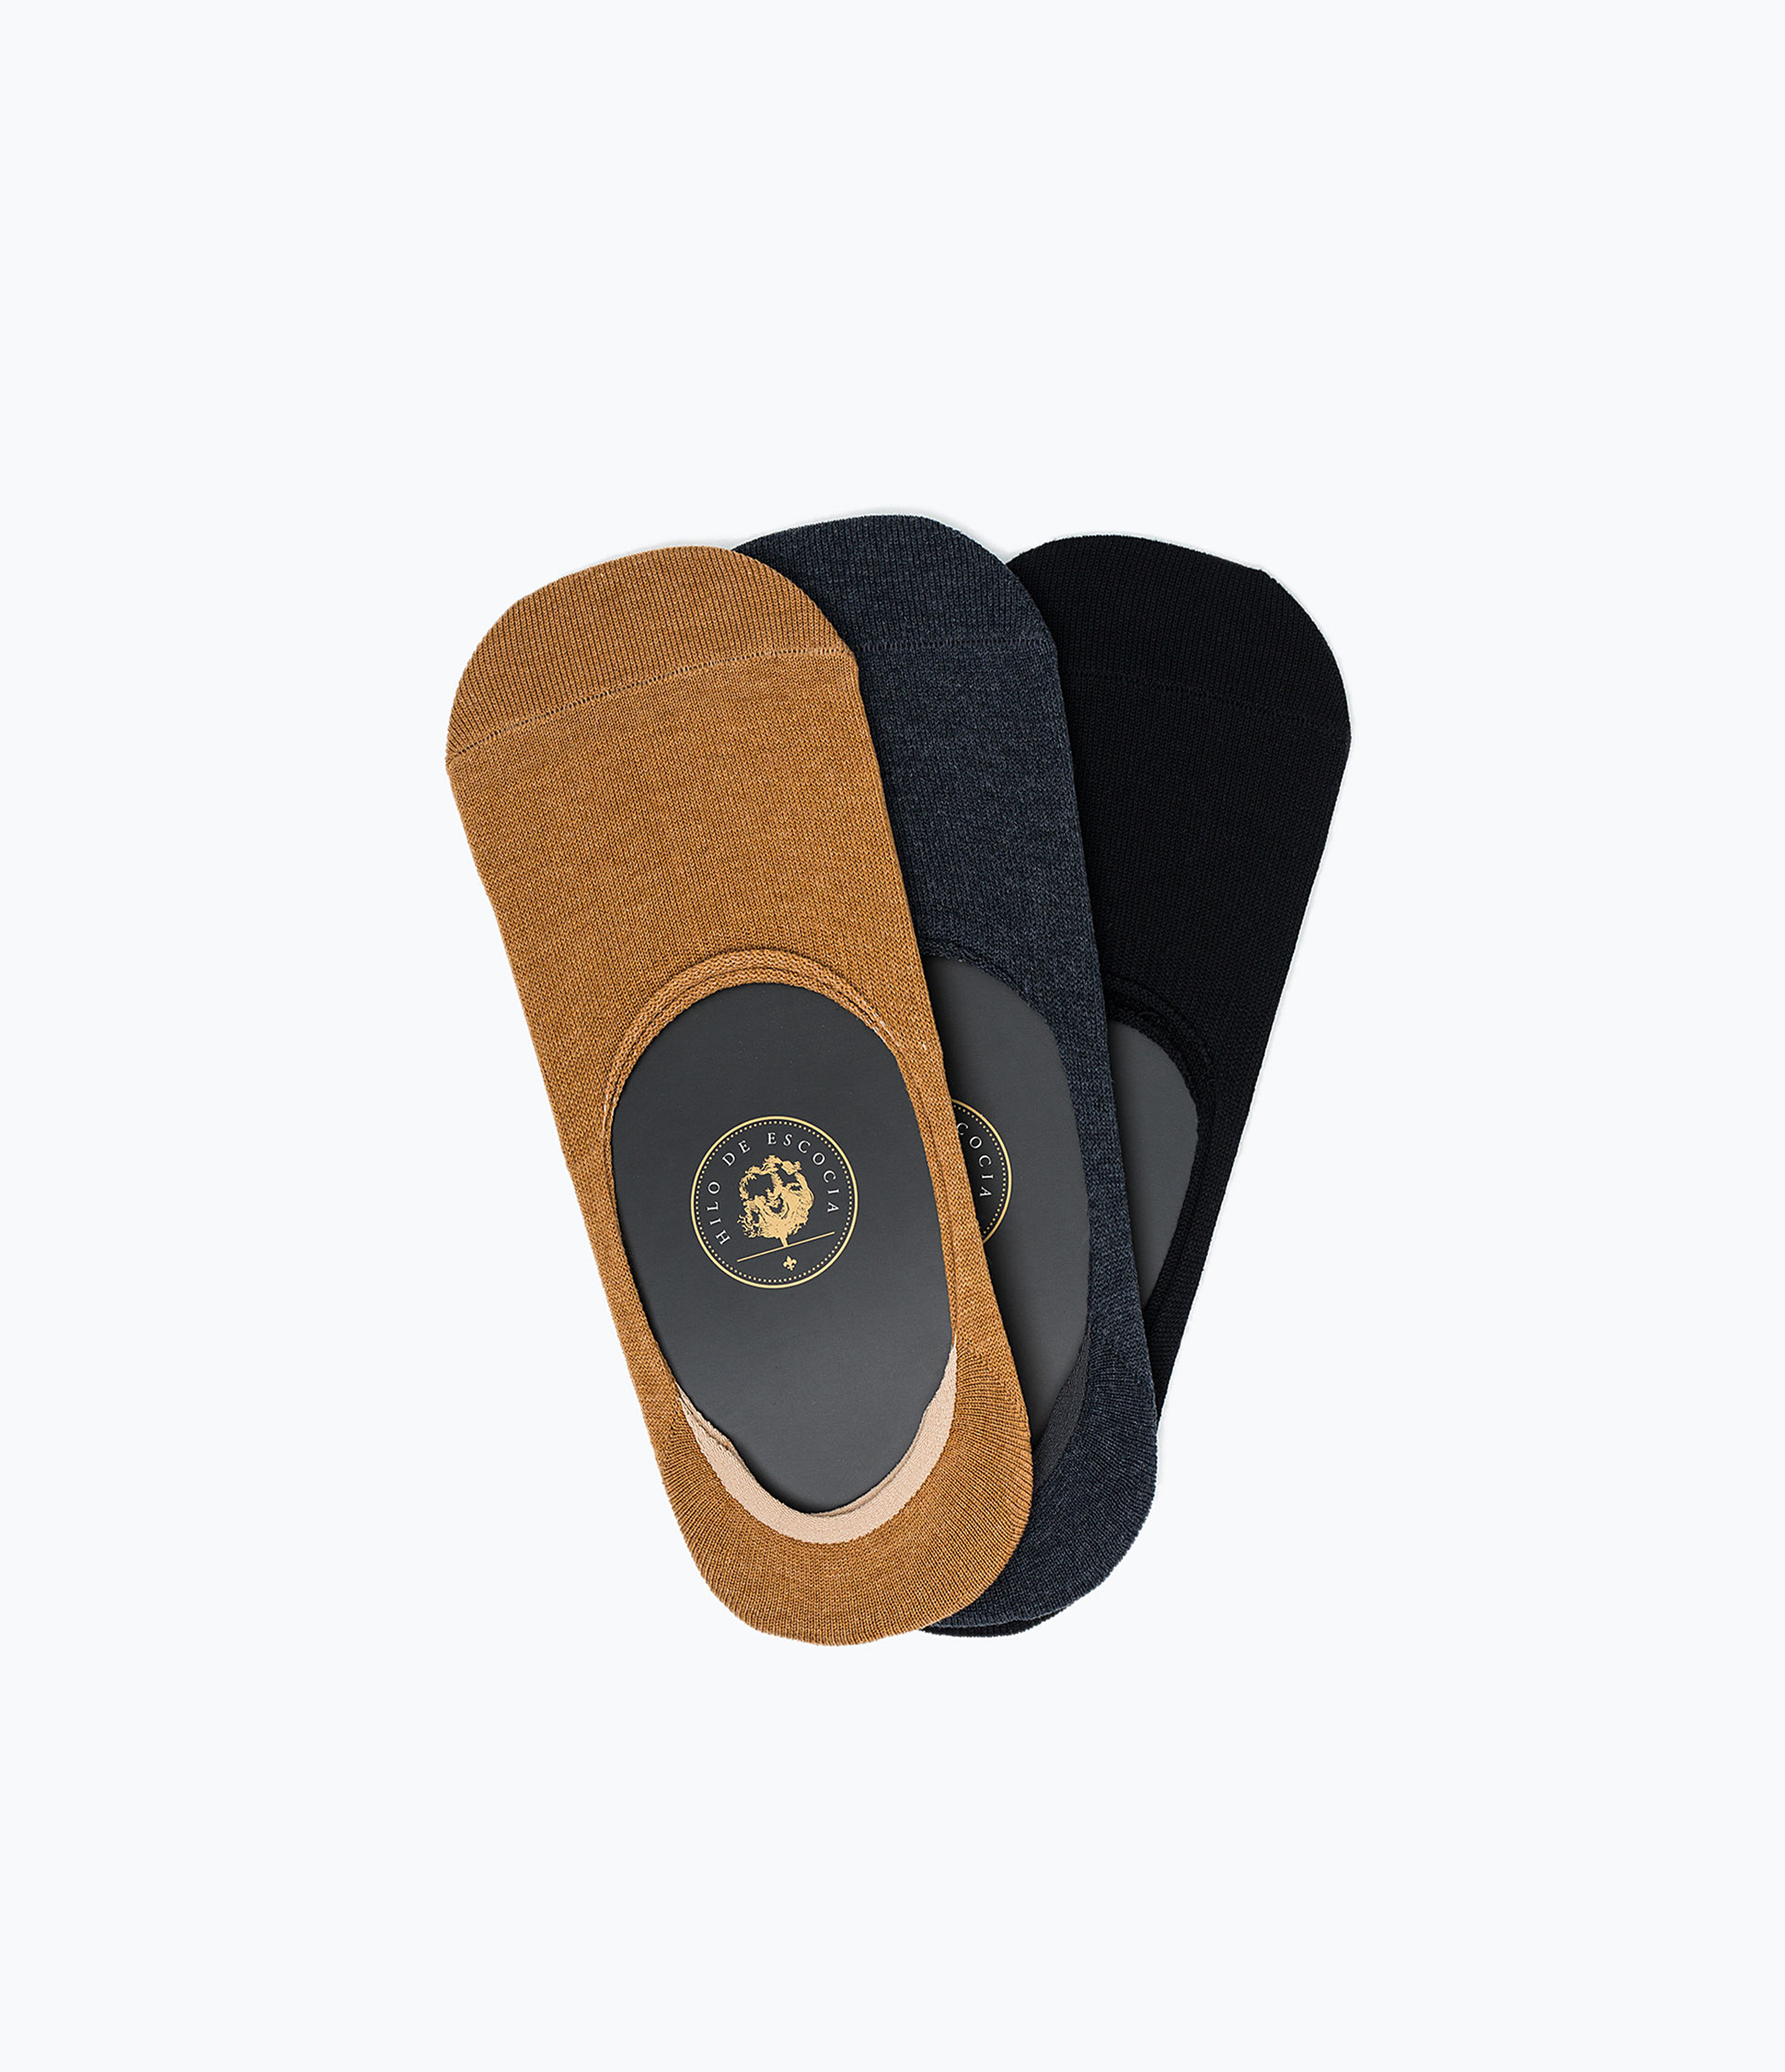 Zara Colorful Shoe Liner Socks In Multicolor For Men | Lyst